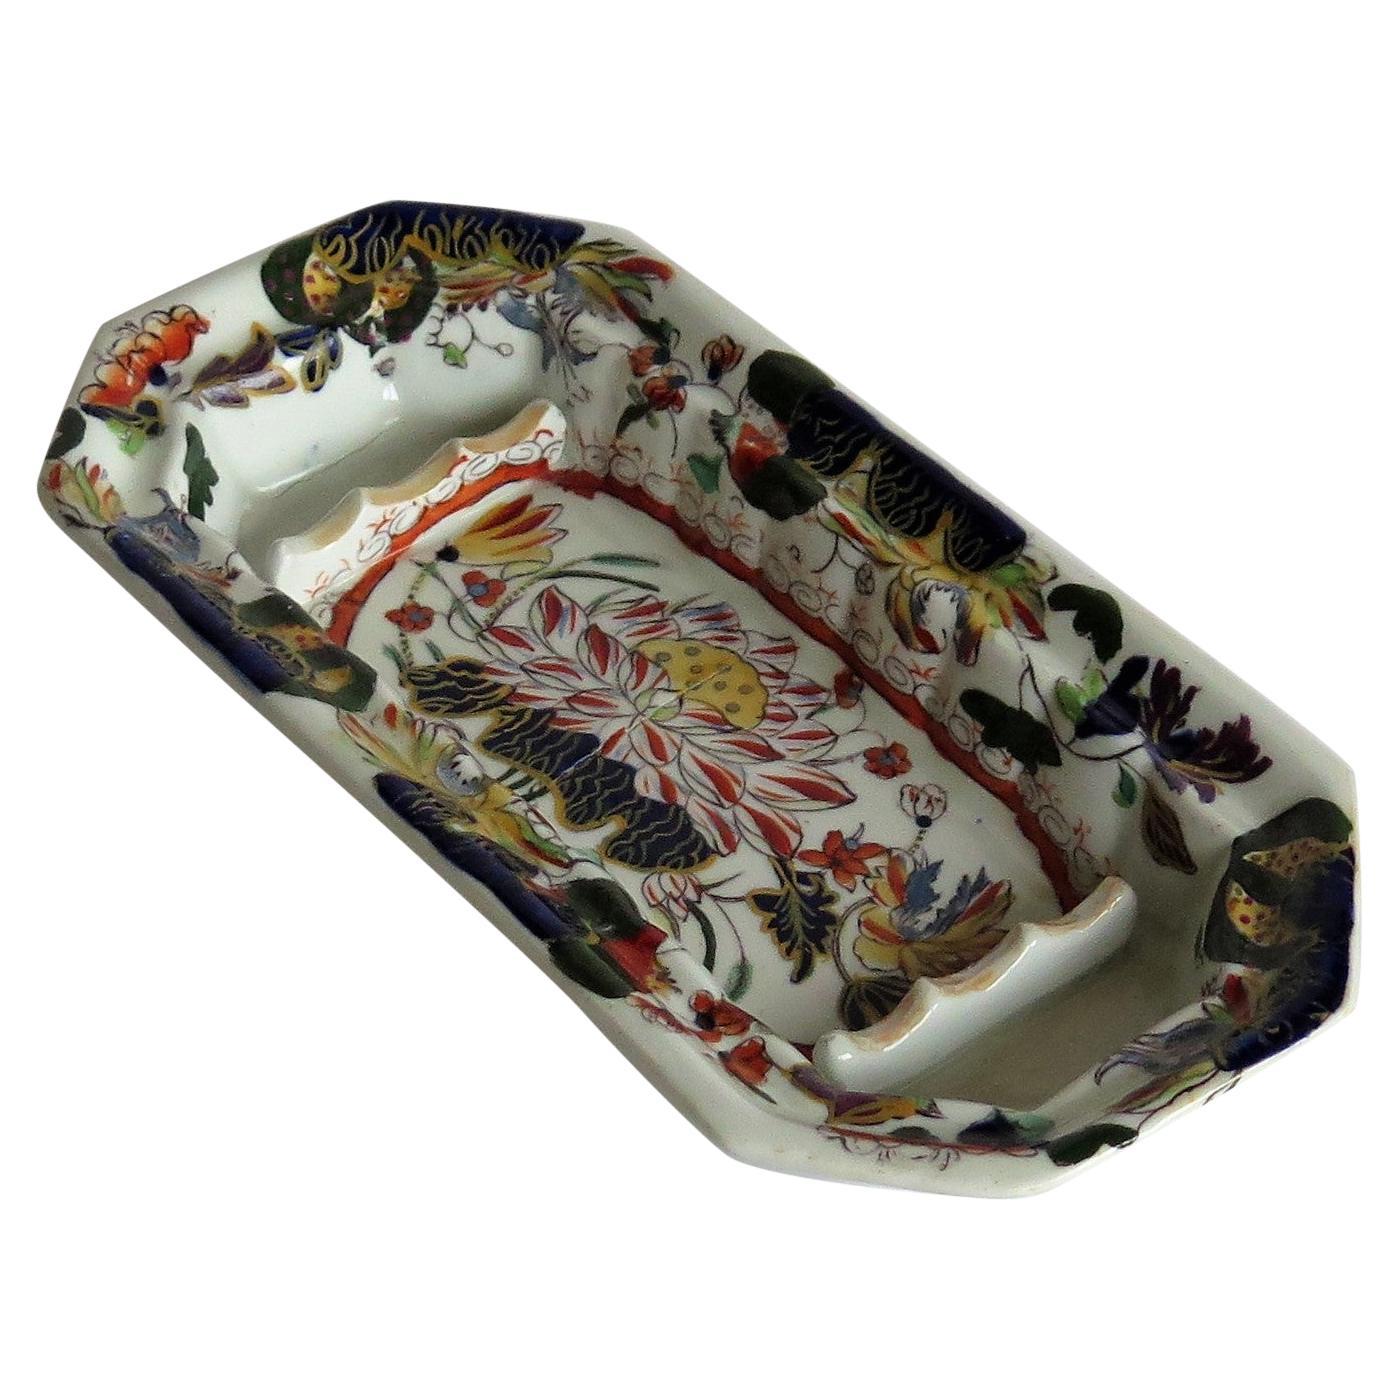 Rare Mason's Ironstone Pen Tray or Dish in Water Lily Pattern, circa 1830